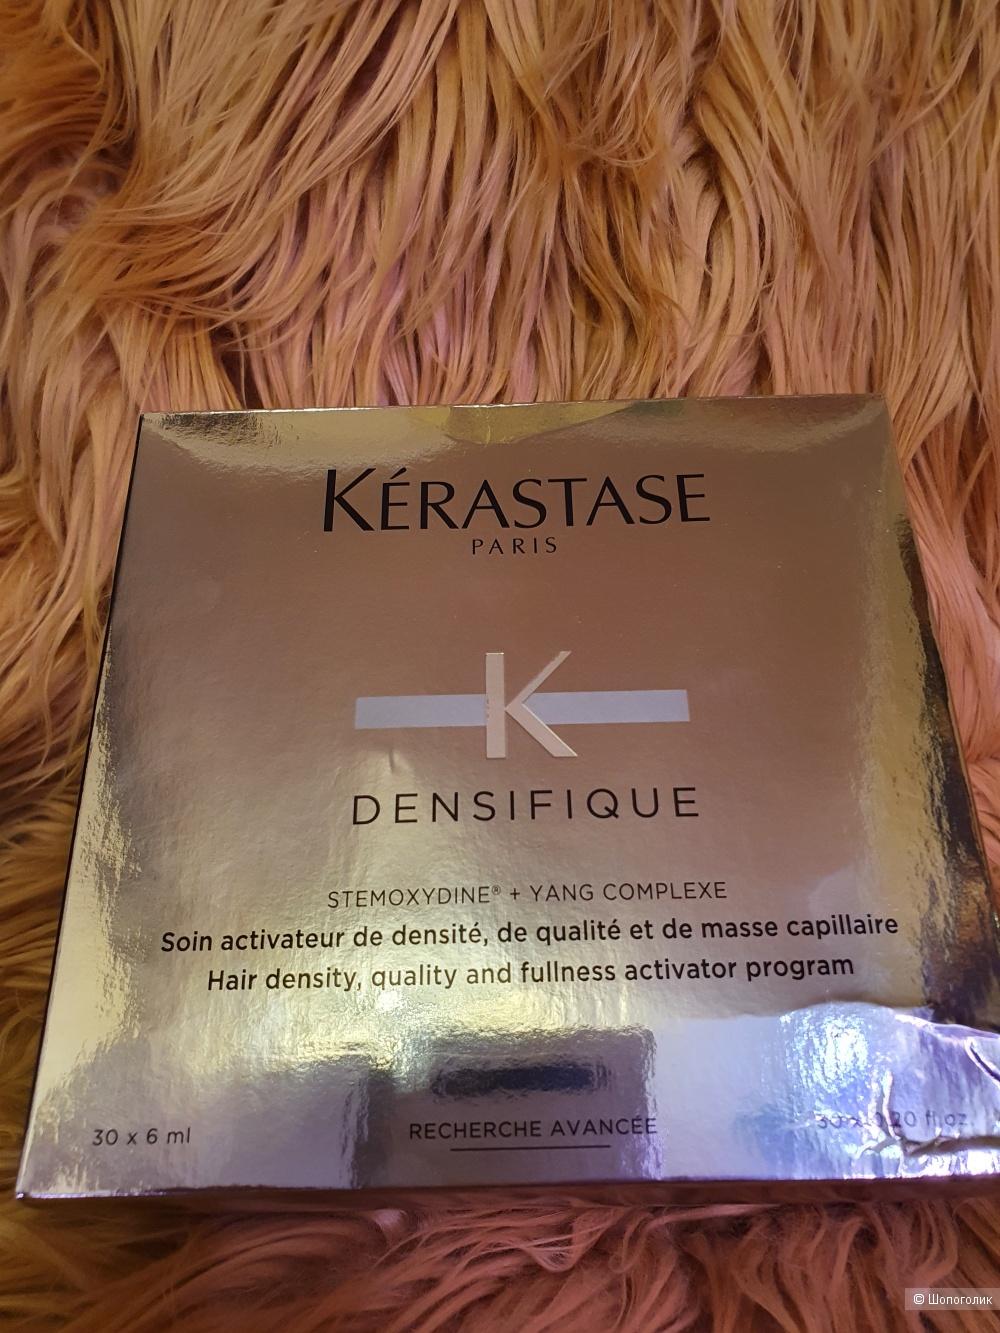 ДЕНСИФИК Ампулы активатор густоты и плотности волос, 30*6мл